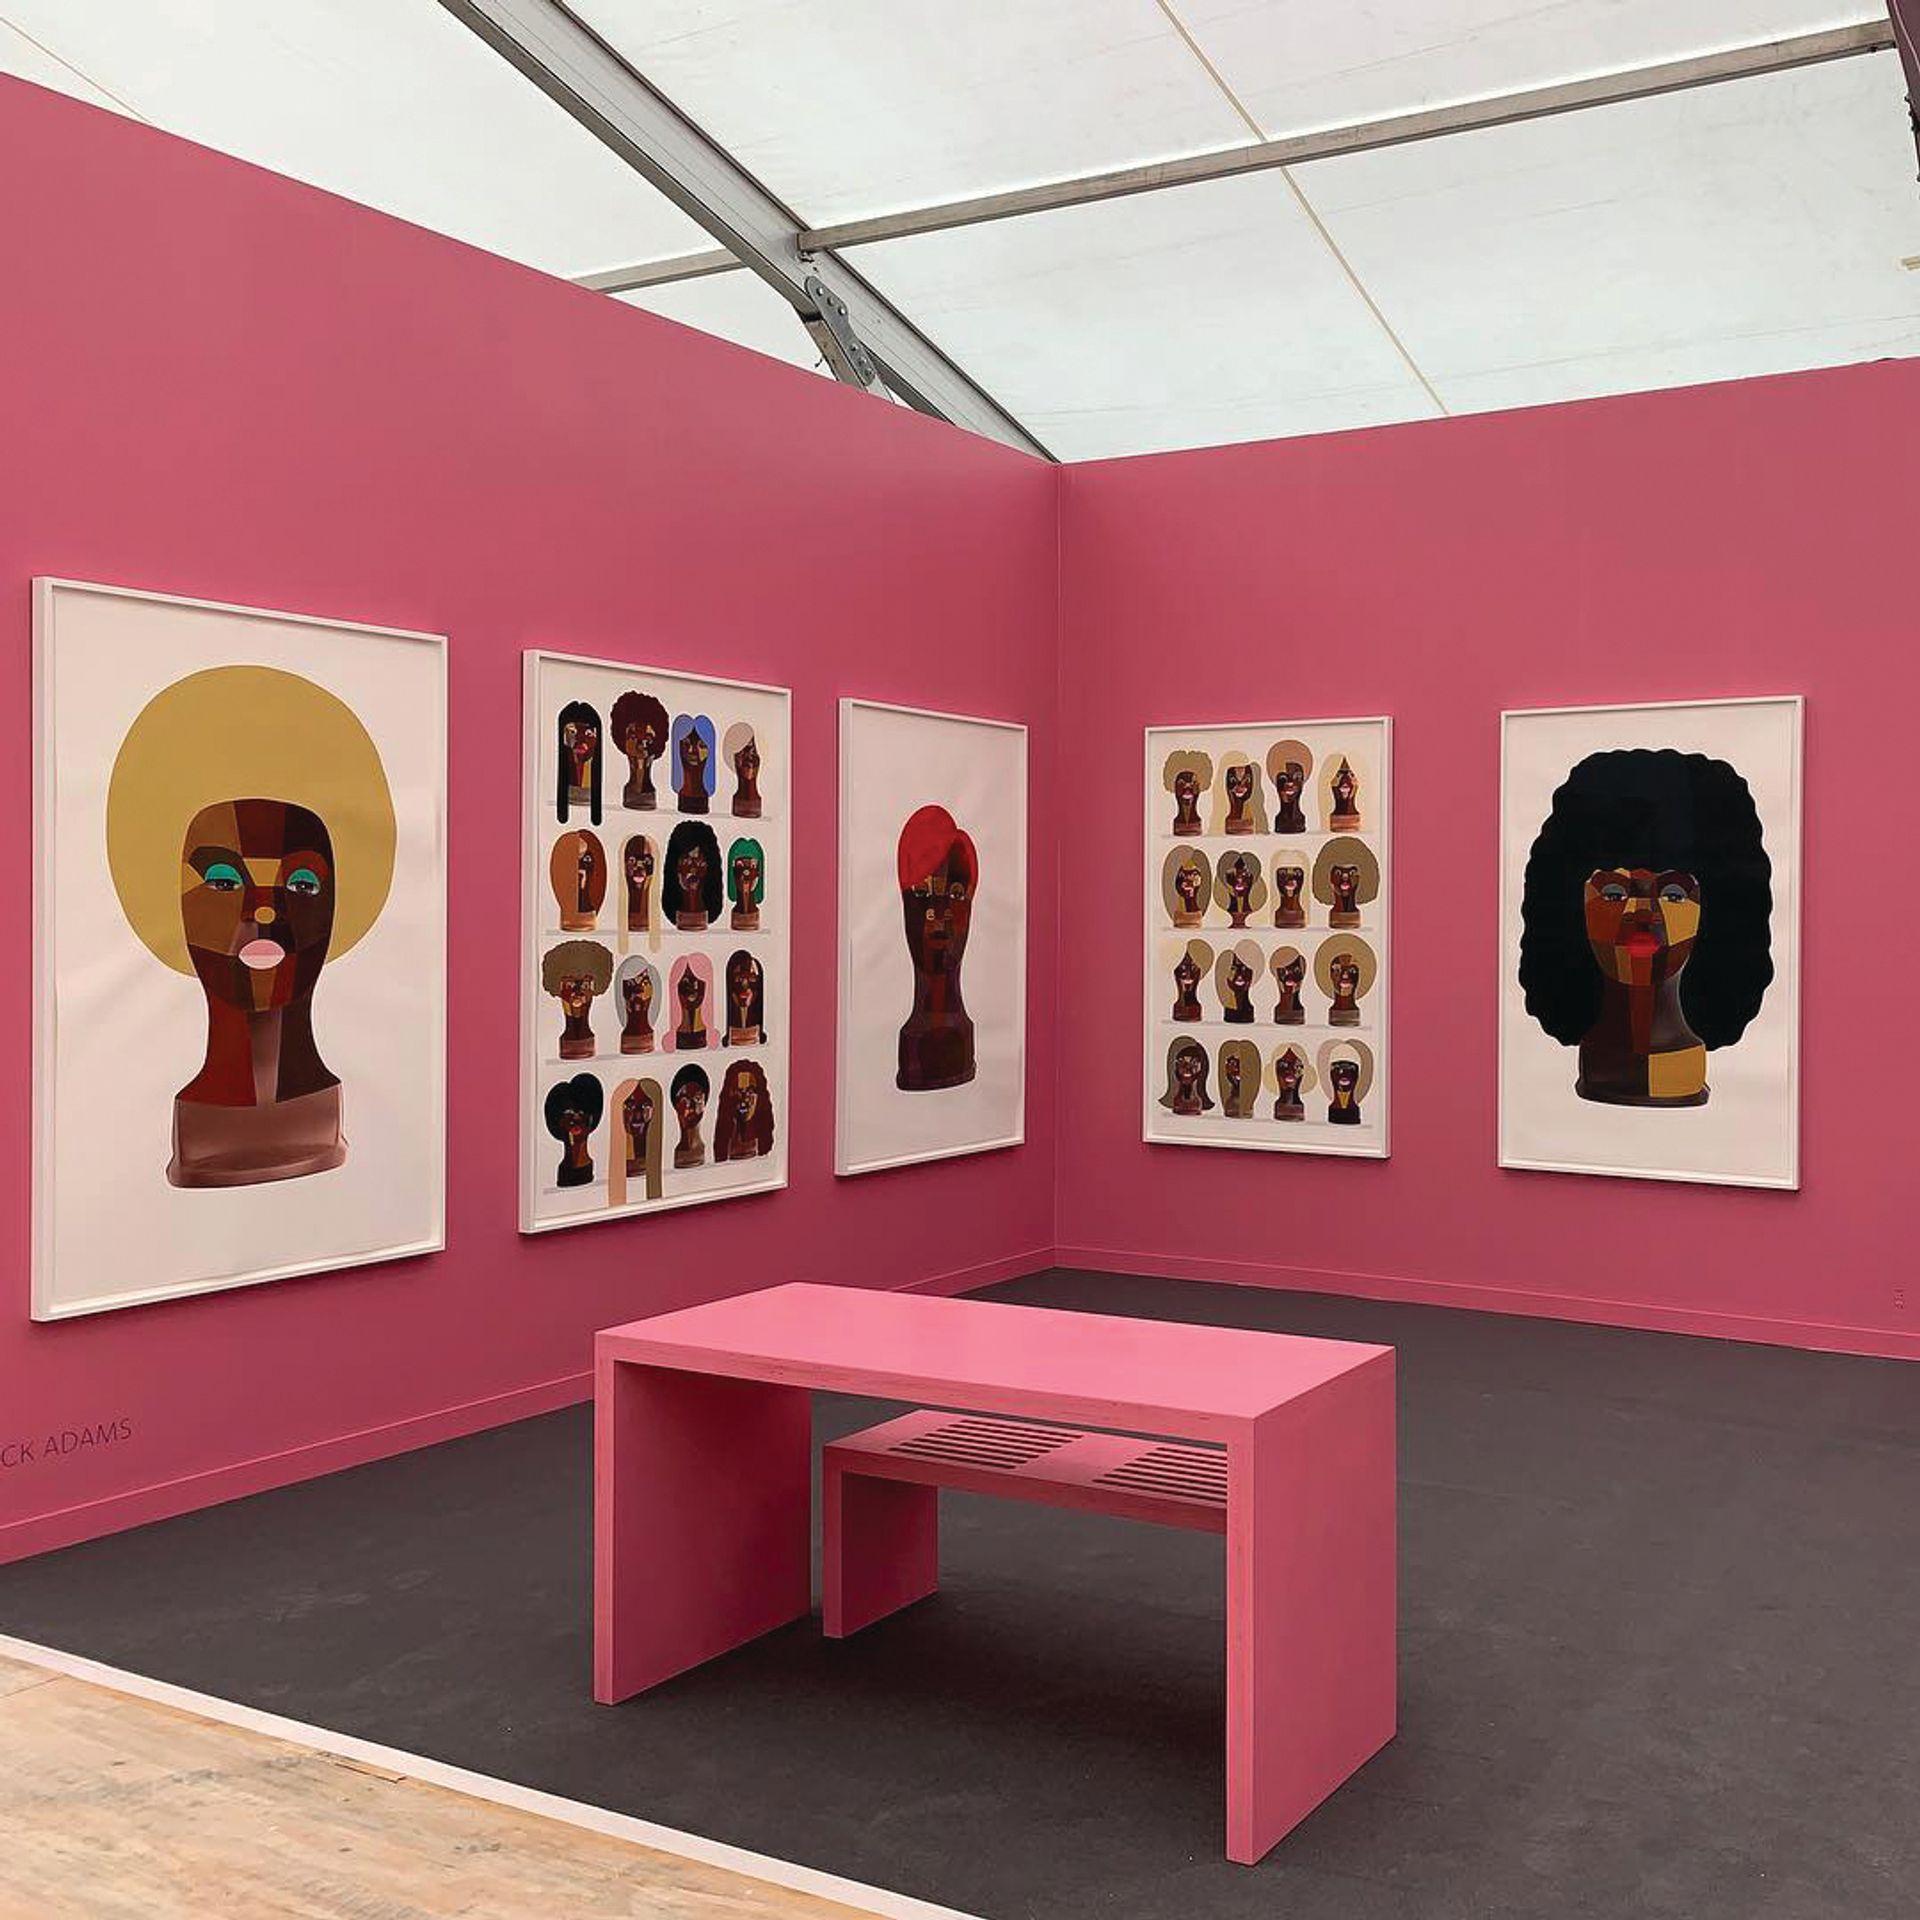 Installation shot of Derrick Adams's Beauty World, part of the artist's Deconstruction Worker series shown by Vigo Gallery at Frieze New York 2019 Courtesy of Vigo Gallery via Instagram